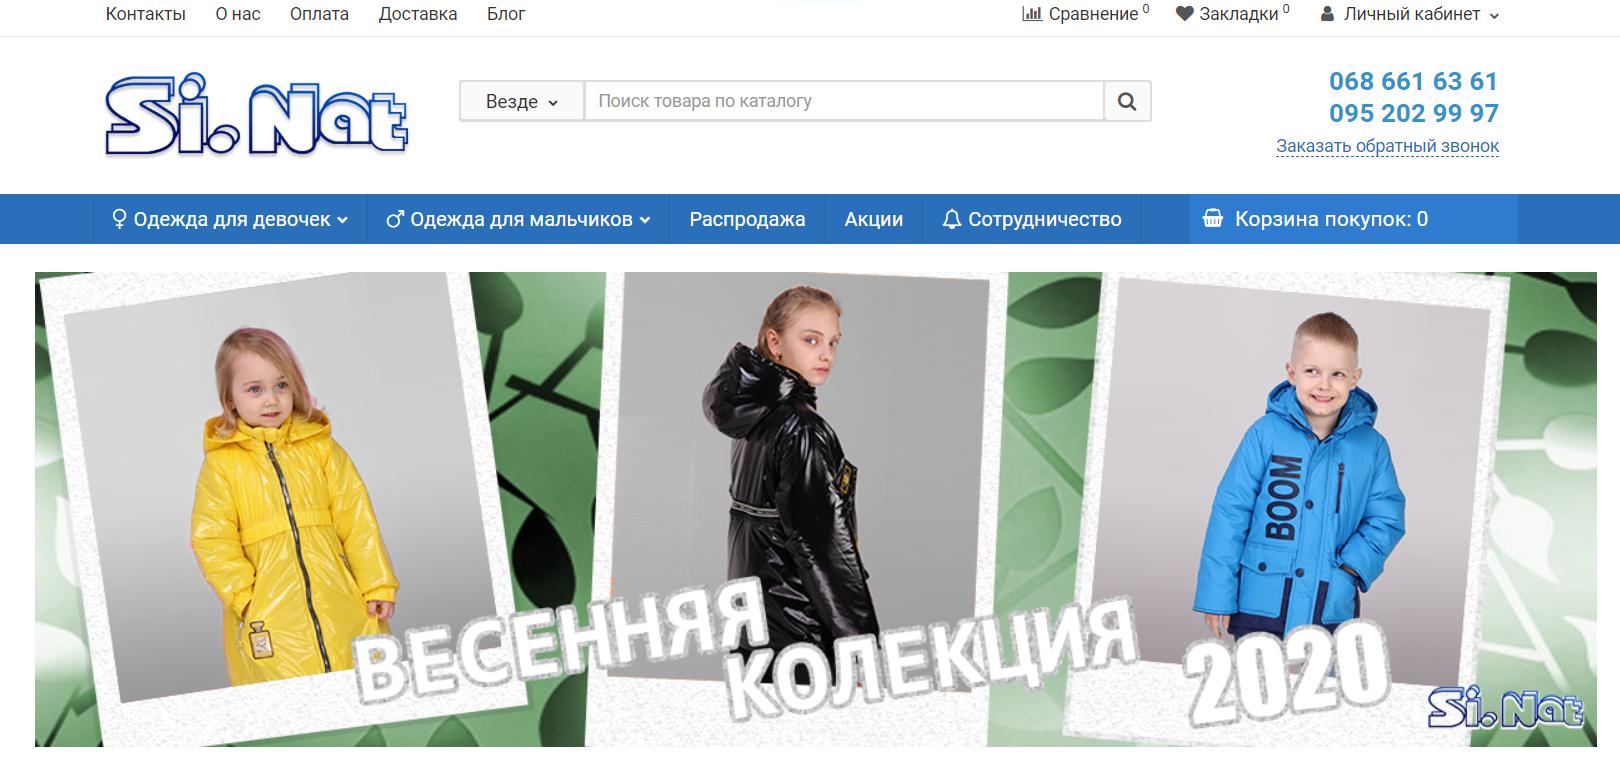 Интернет-магазин SiNat